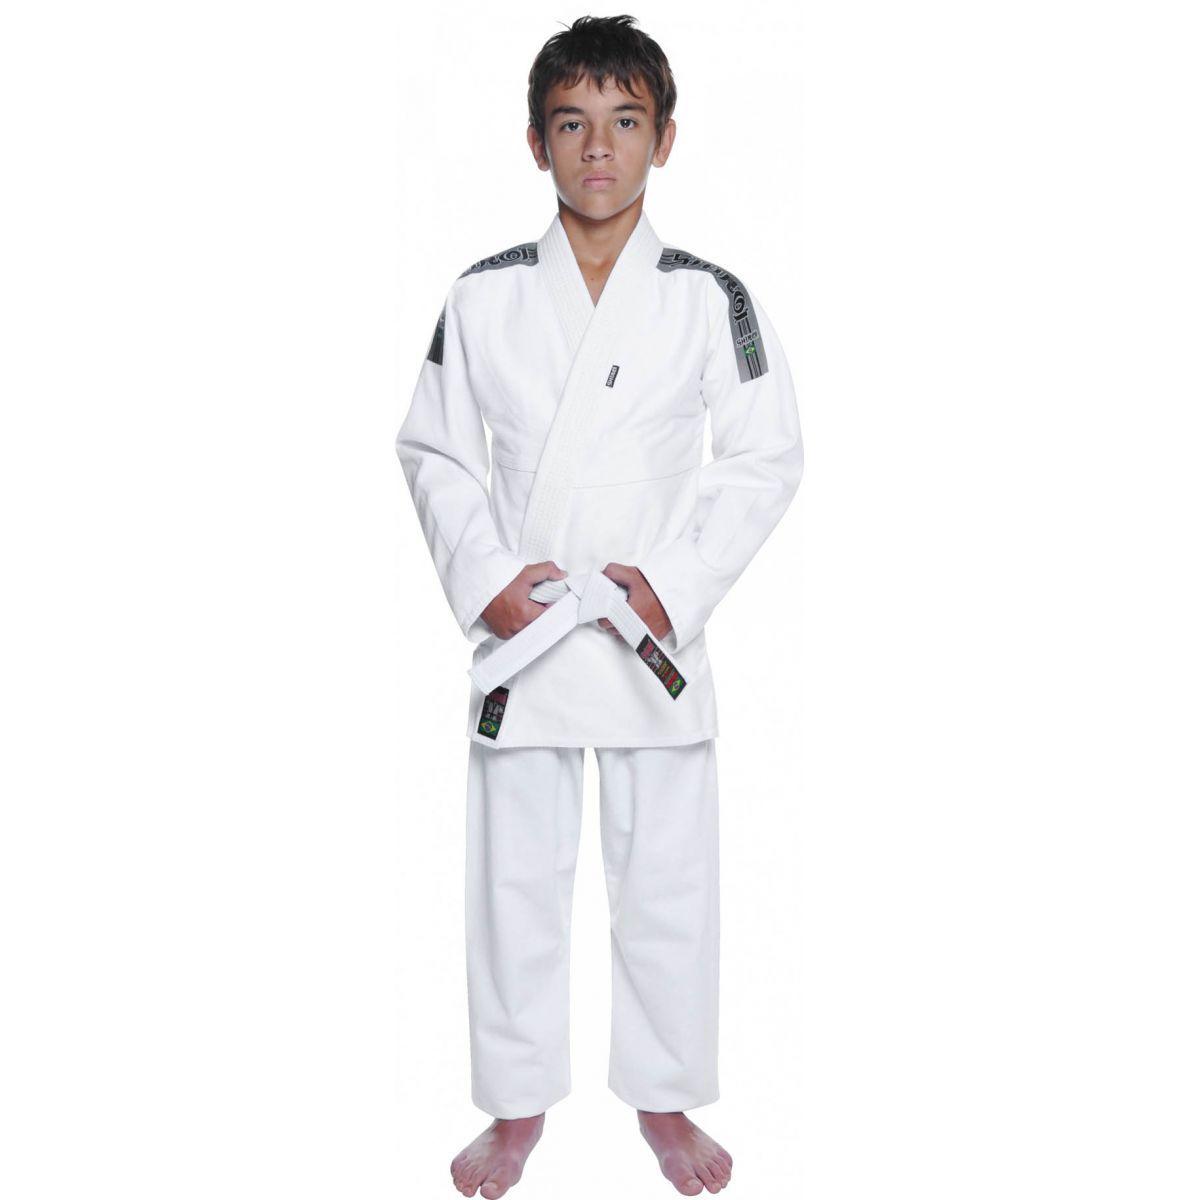 Kimono Jiu Jitsu - Trancadinho  - Tradicional - Shiroi - Branco - Infantil .